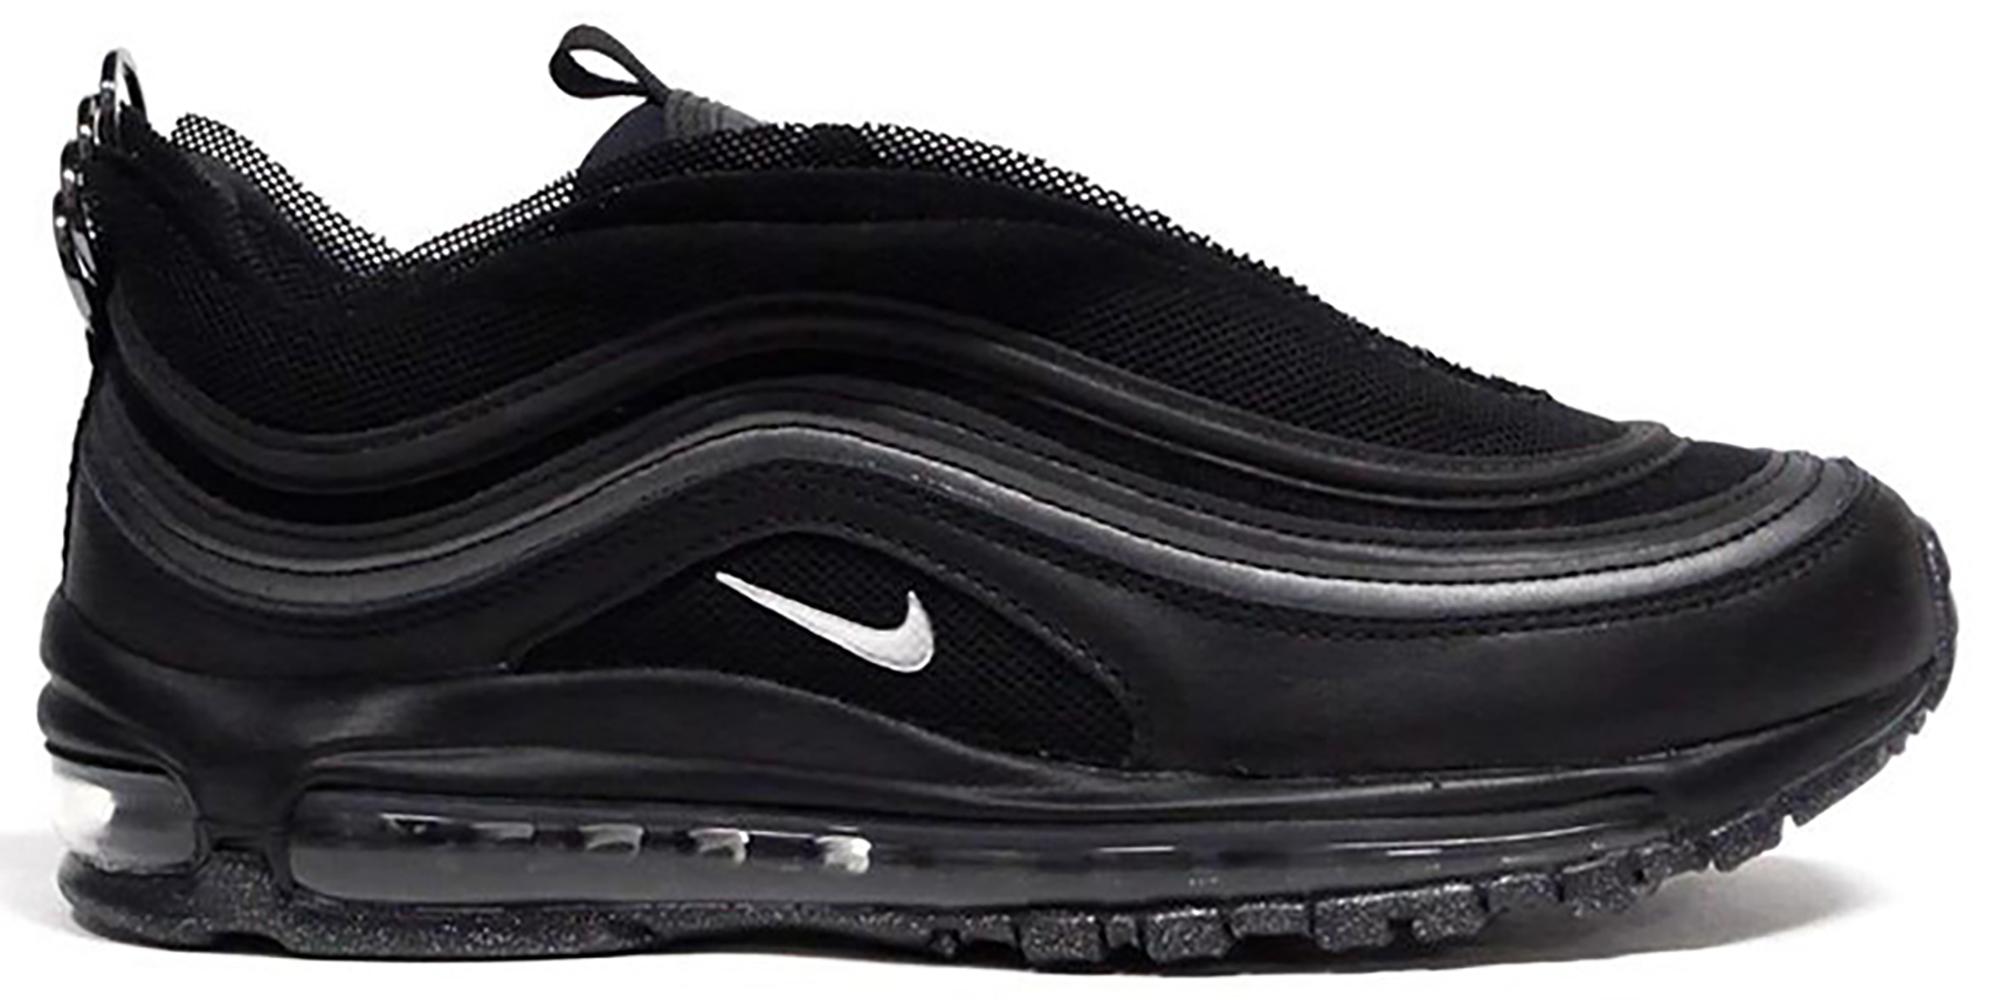 Nike Air Max 97 LX Sakura Black (W